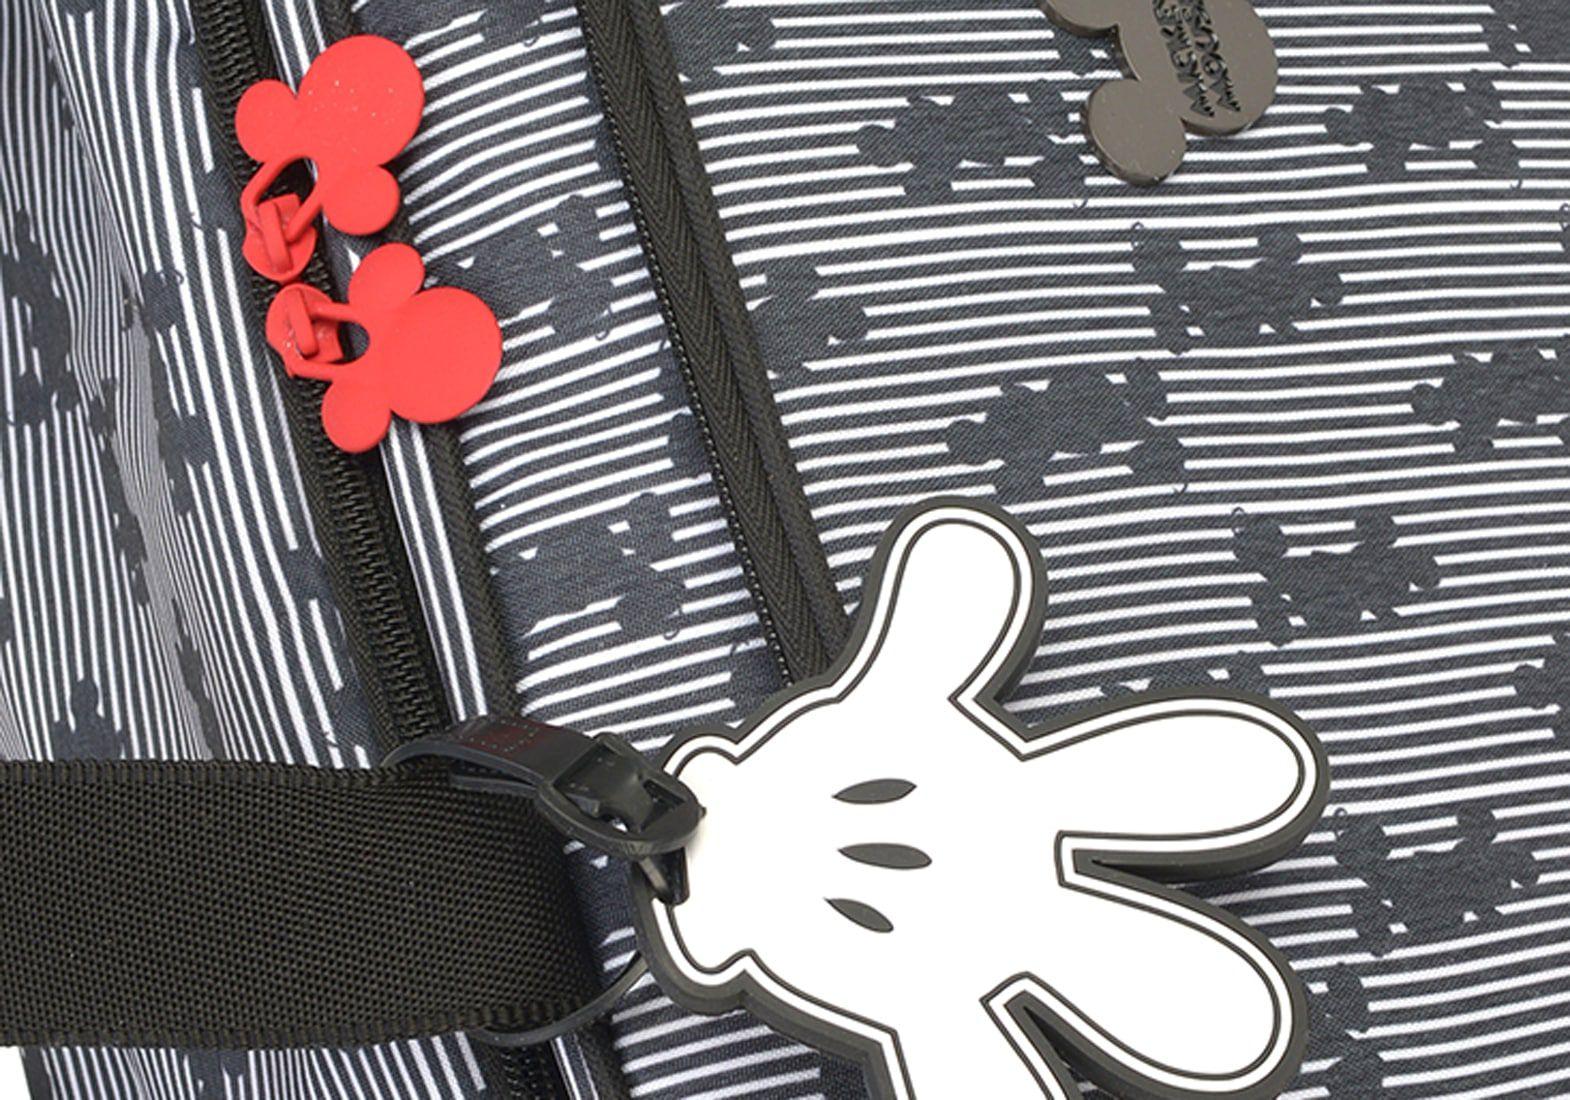 Pequena Mala Sacola Viagem Mickey Mouse 90 Anos Original